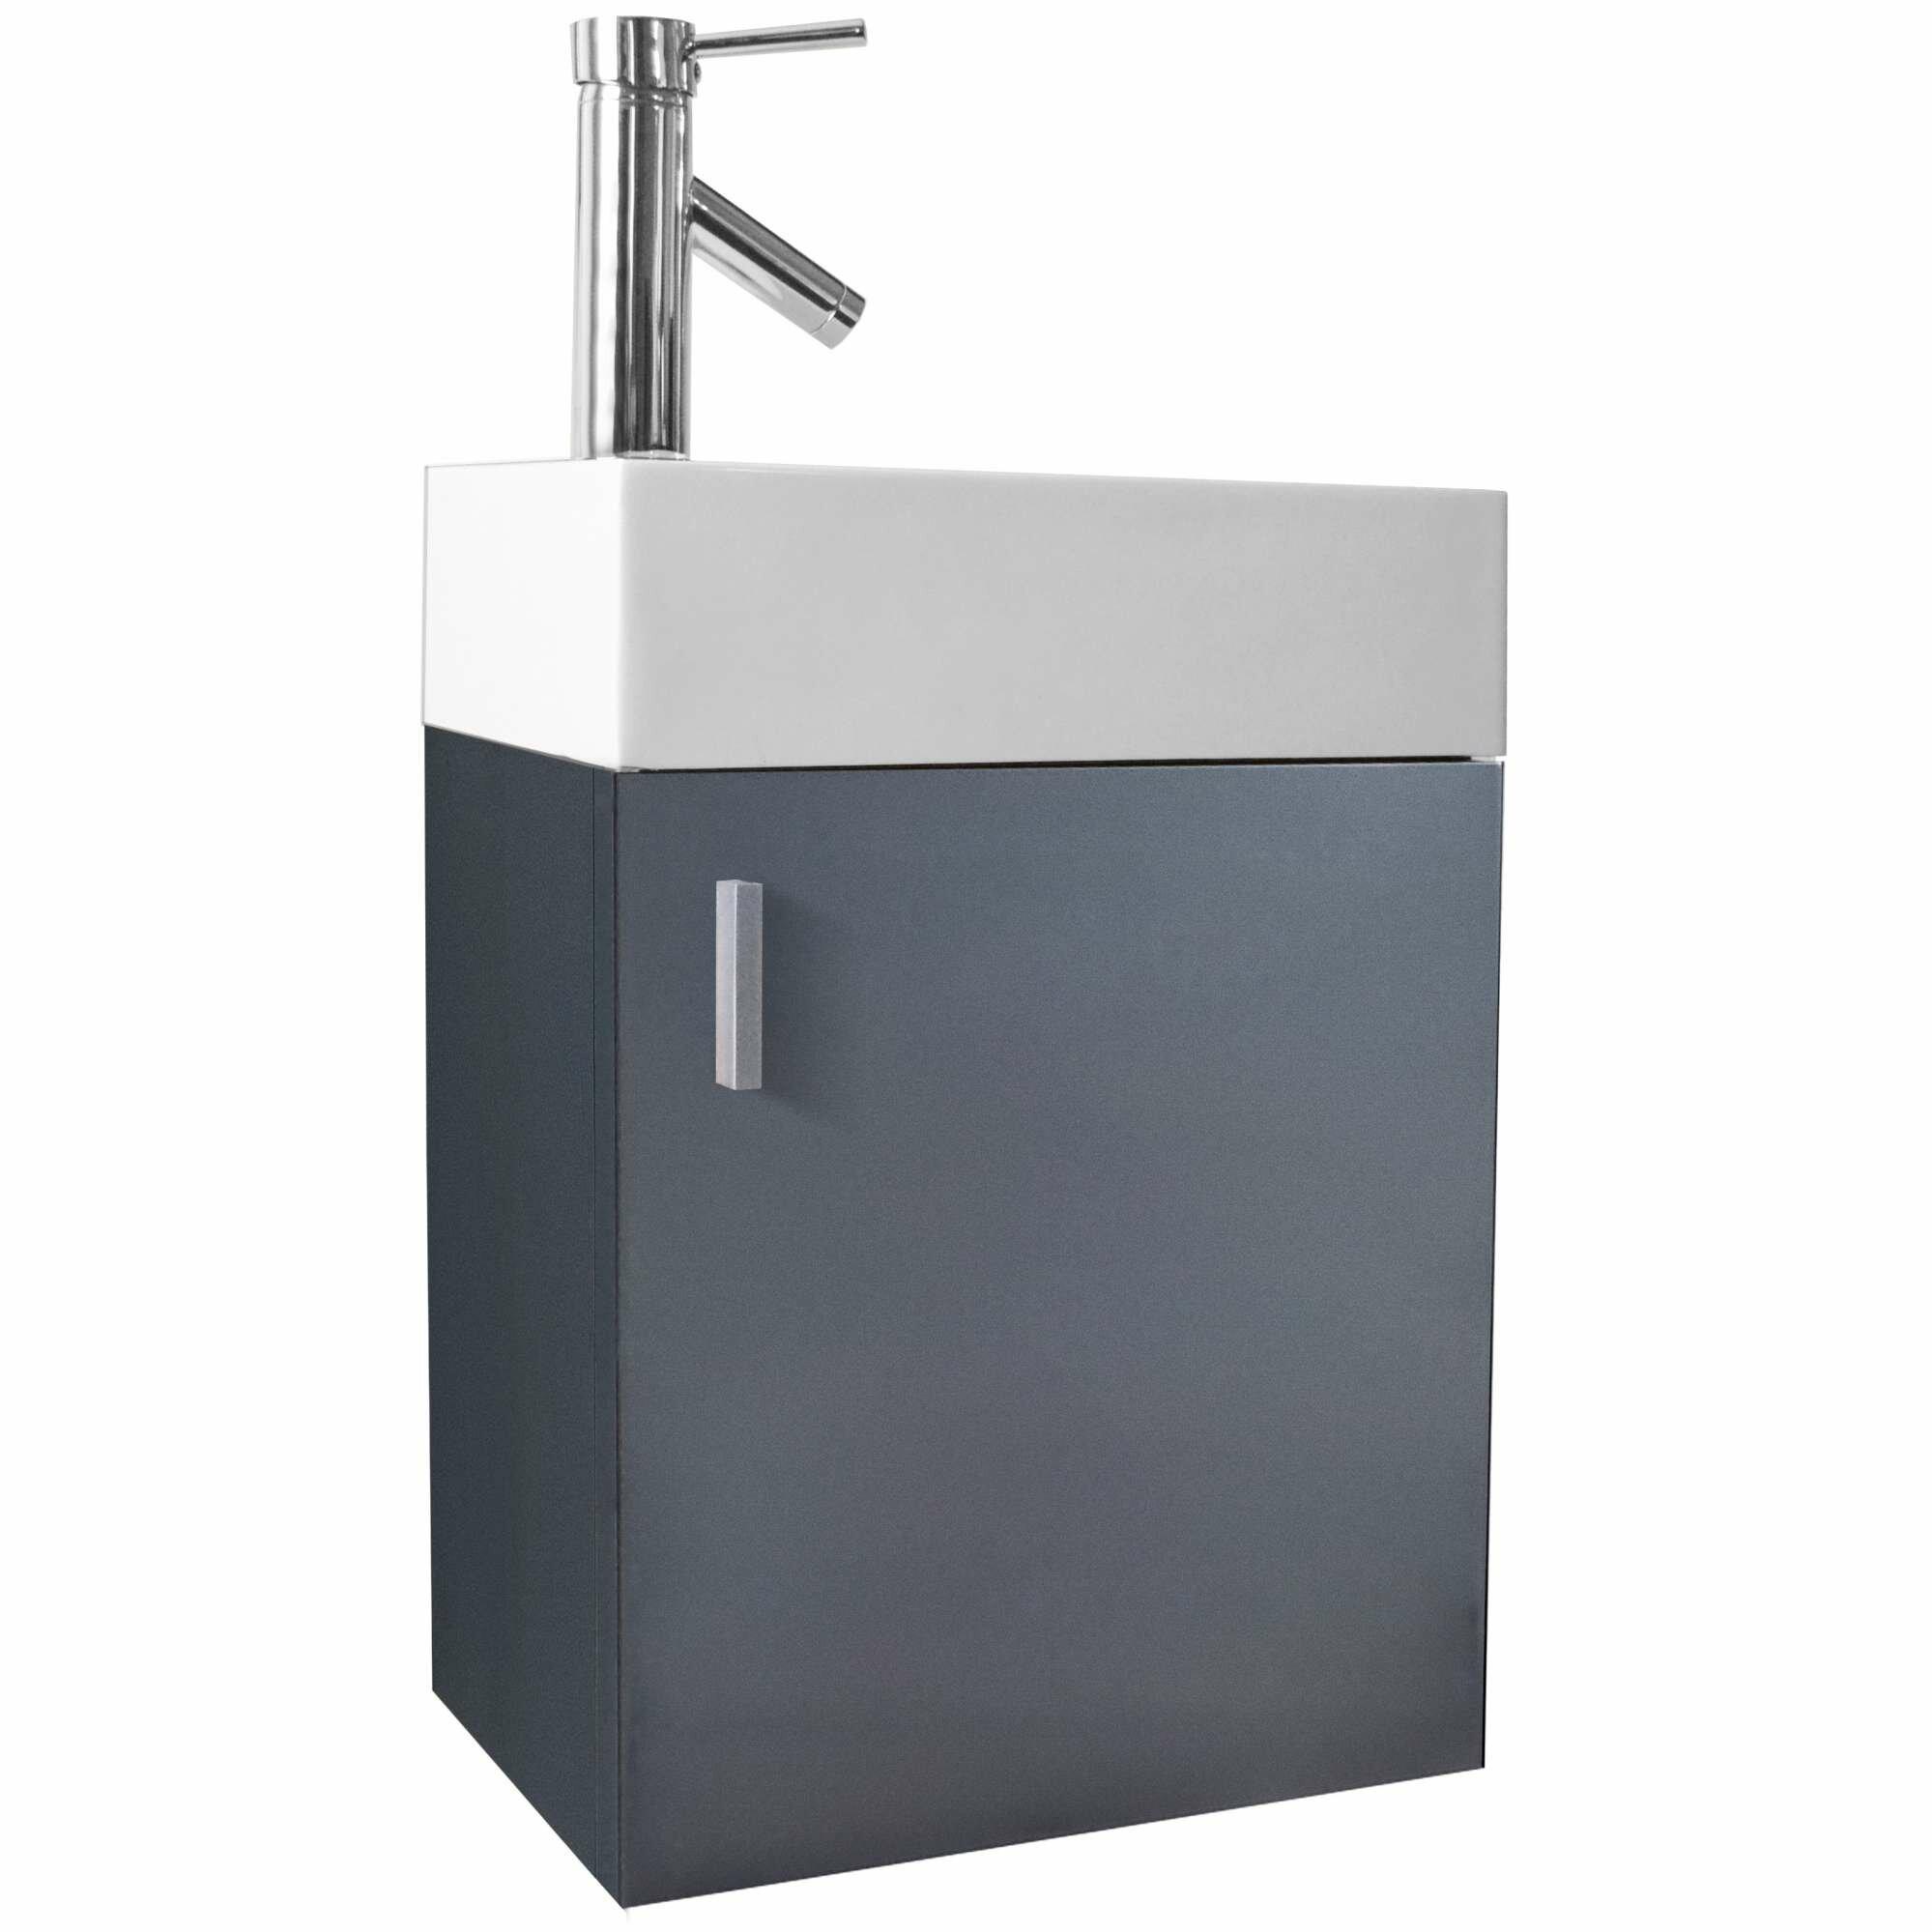 Virtu bathroom accessories - Carino 16 Single Bathroom Vanity Set With White Top